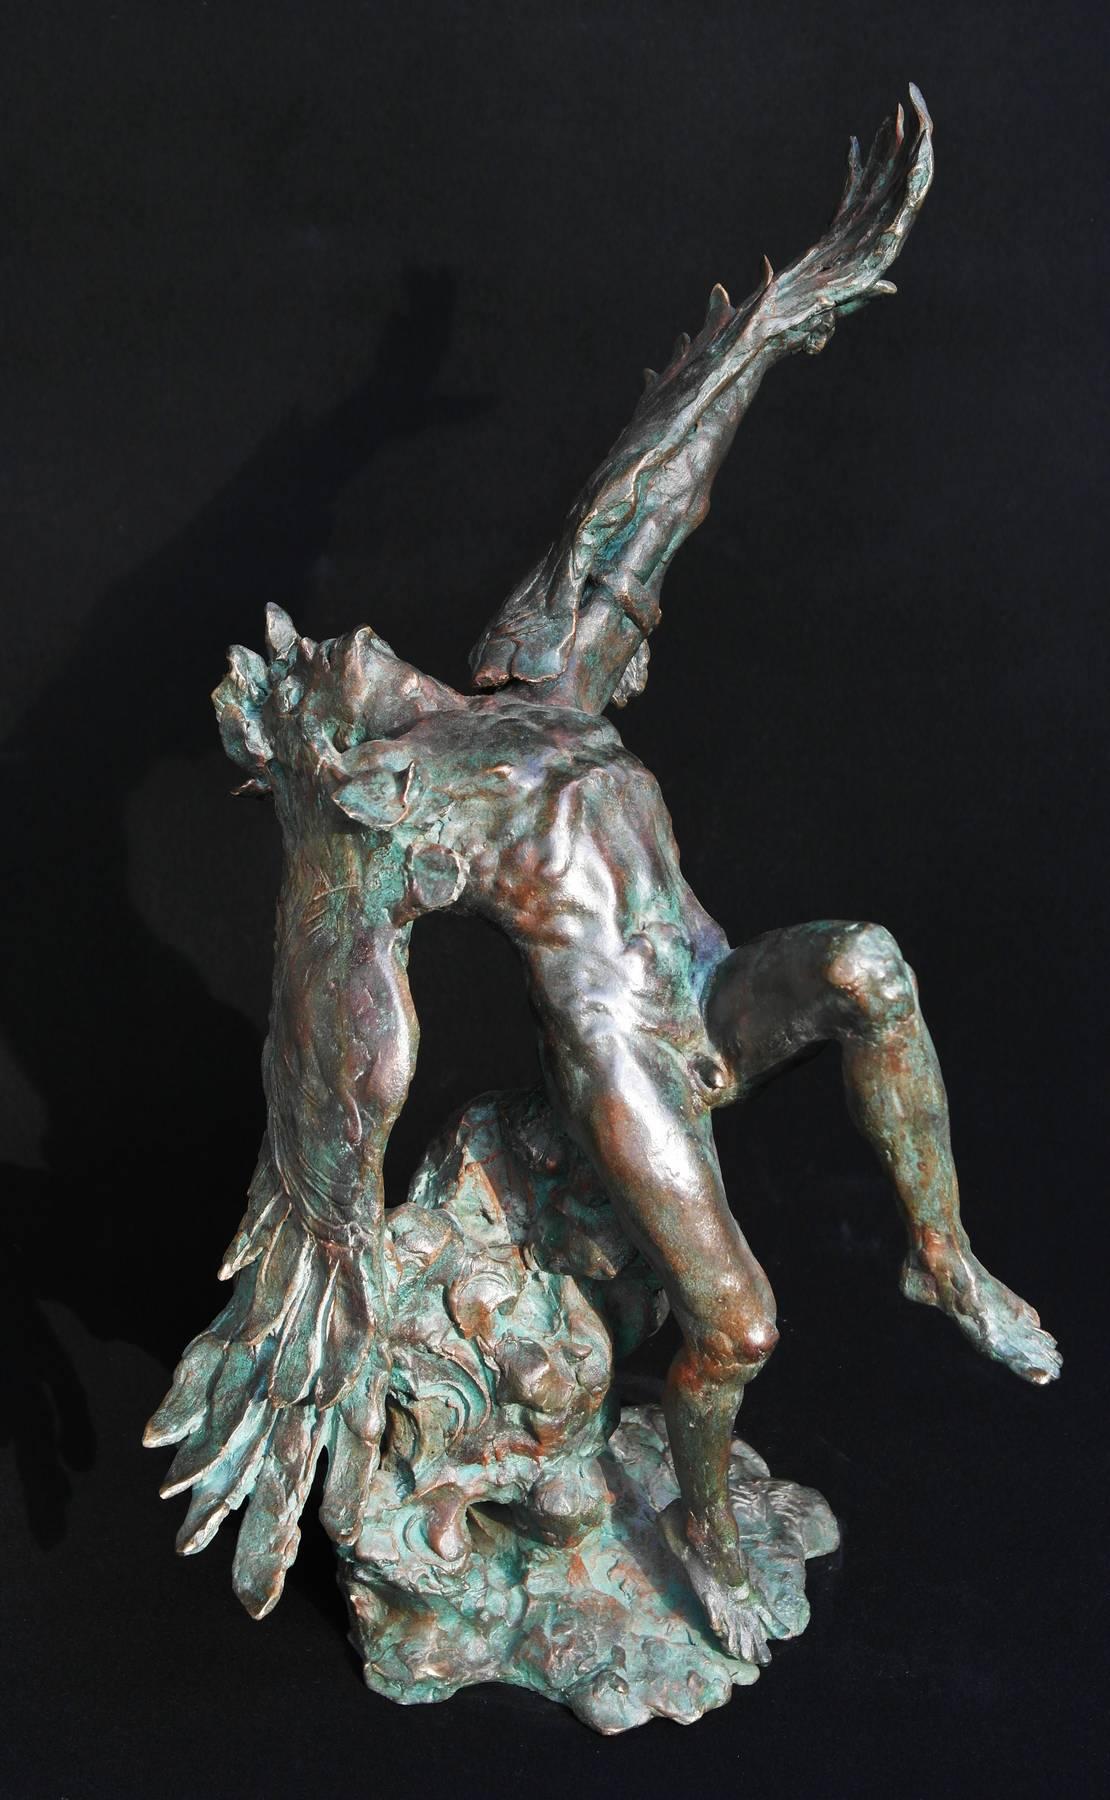 Aldo-Falchi-La-caduta-di-Icaro-1990-Bronzo